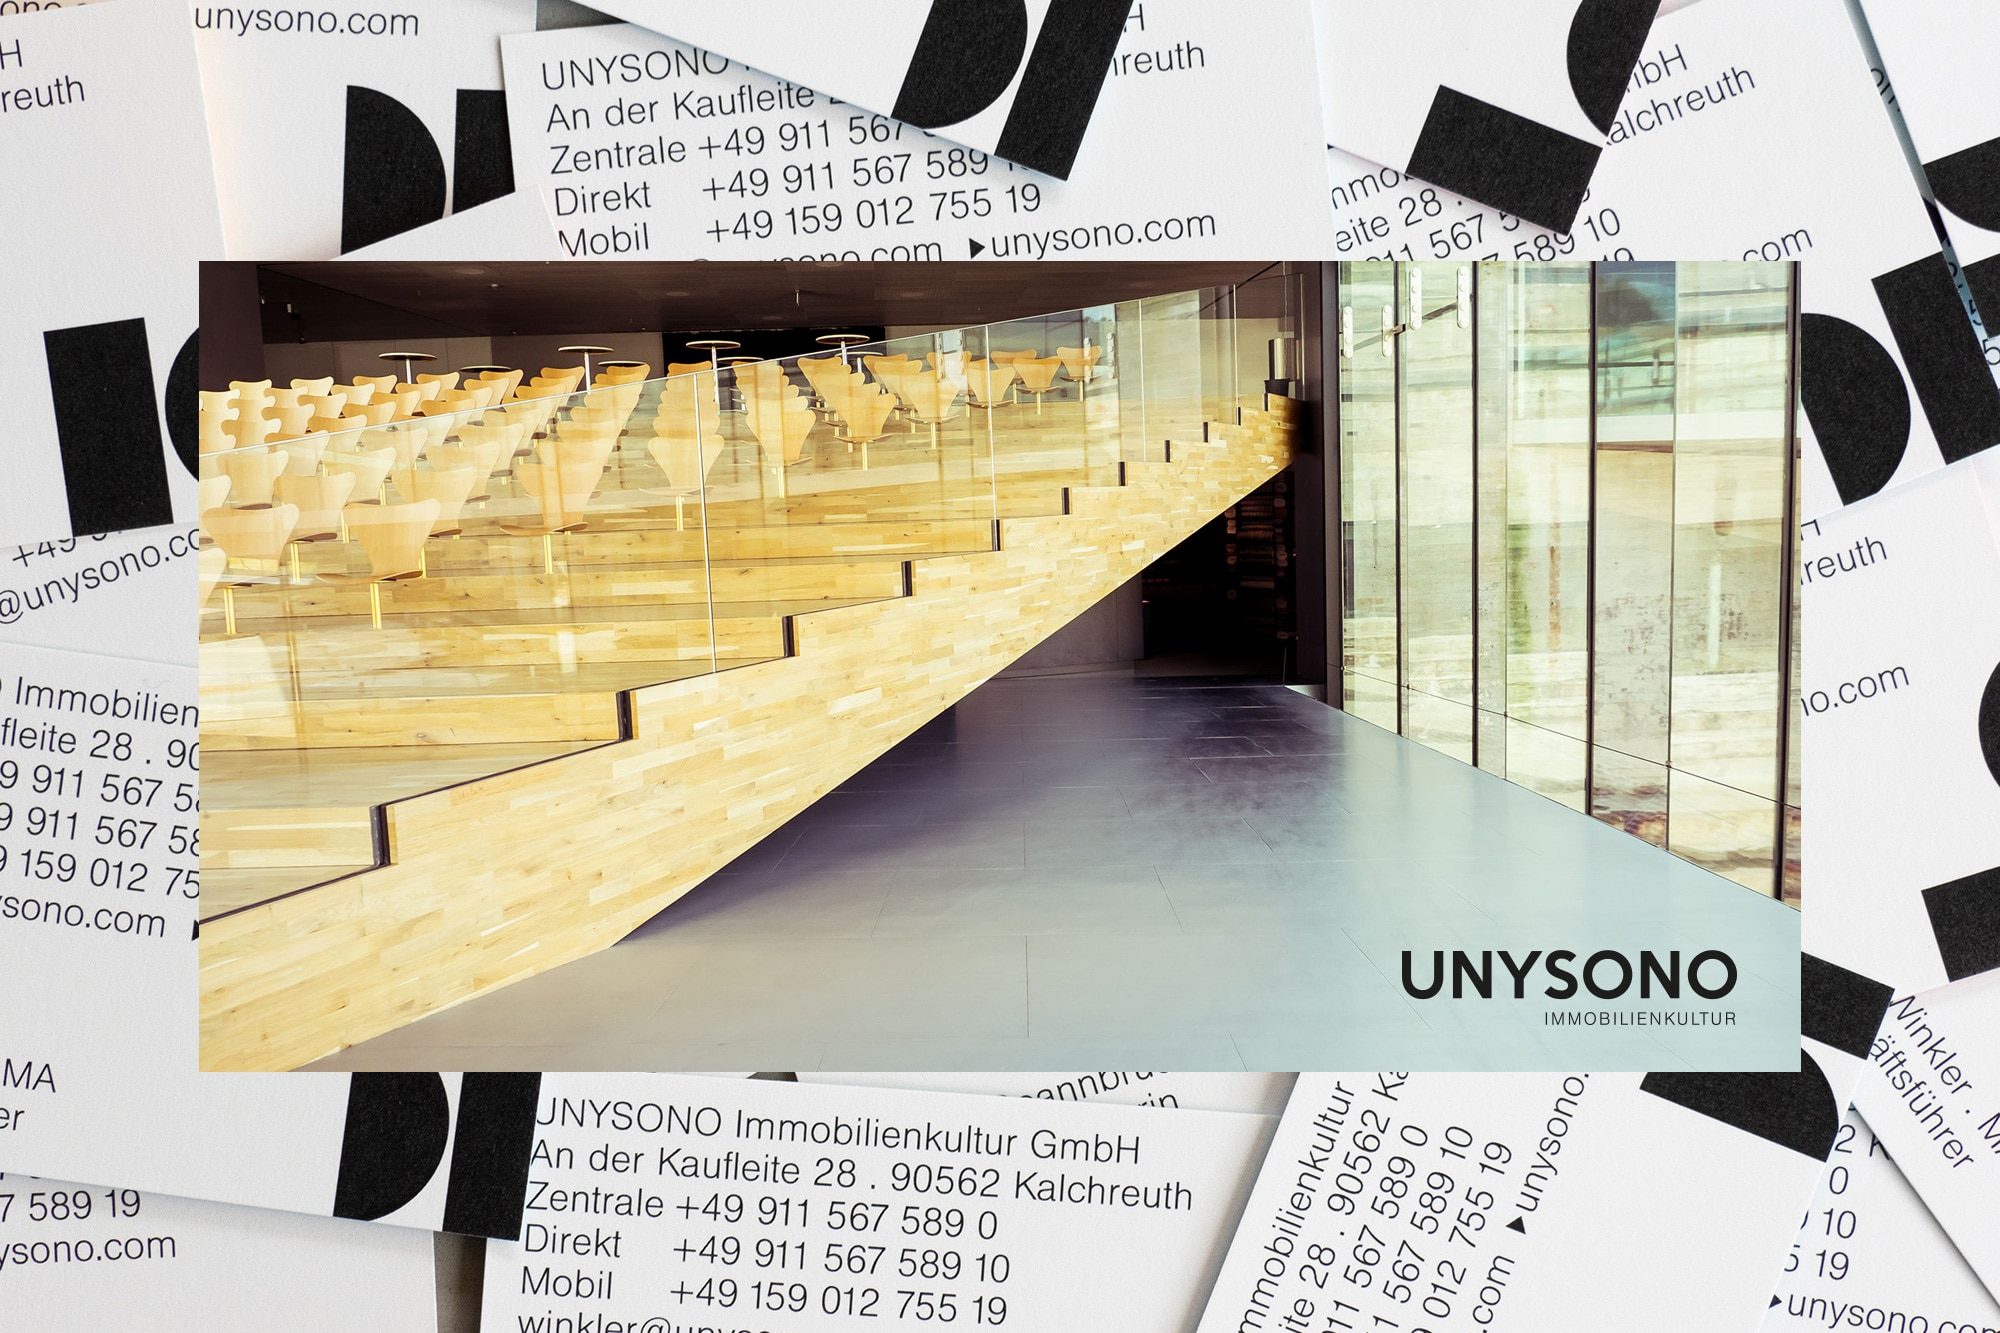 planx-UNYSONO-CorporateDesign08-MOCK01